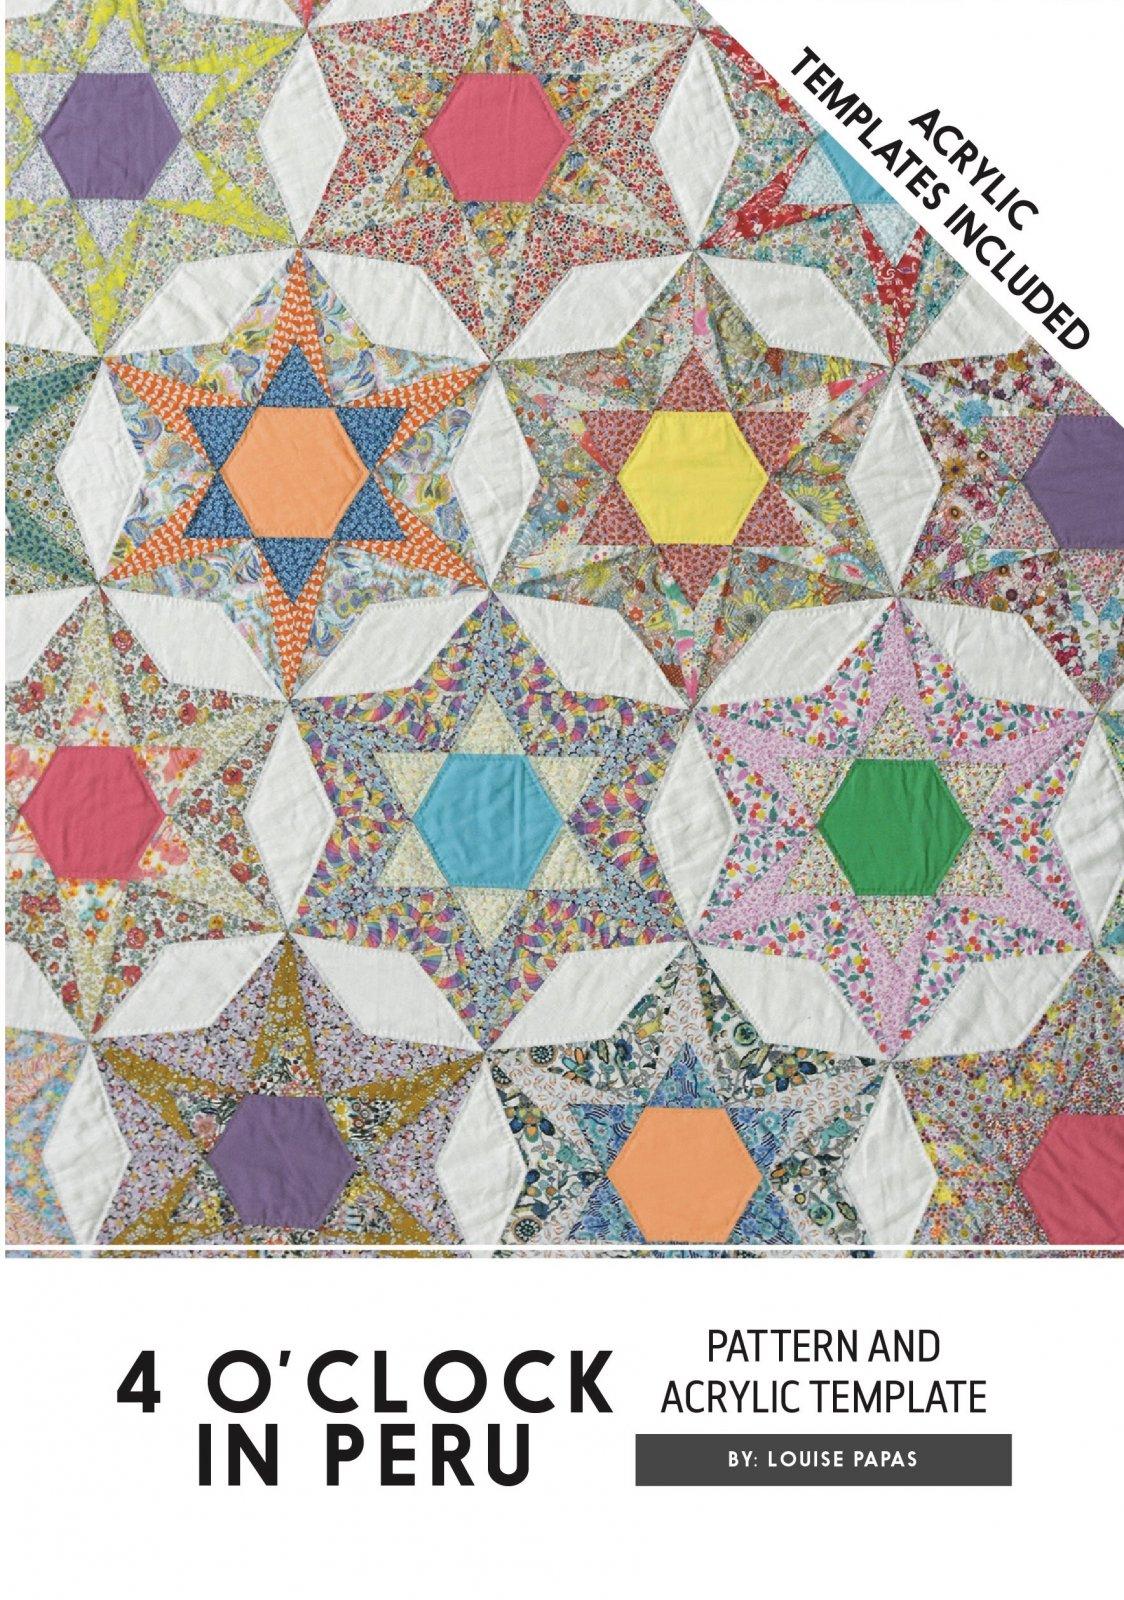 4 O'Clock In Peru Pattern And Template (ATI) by Louise Papas